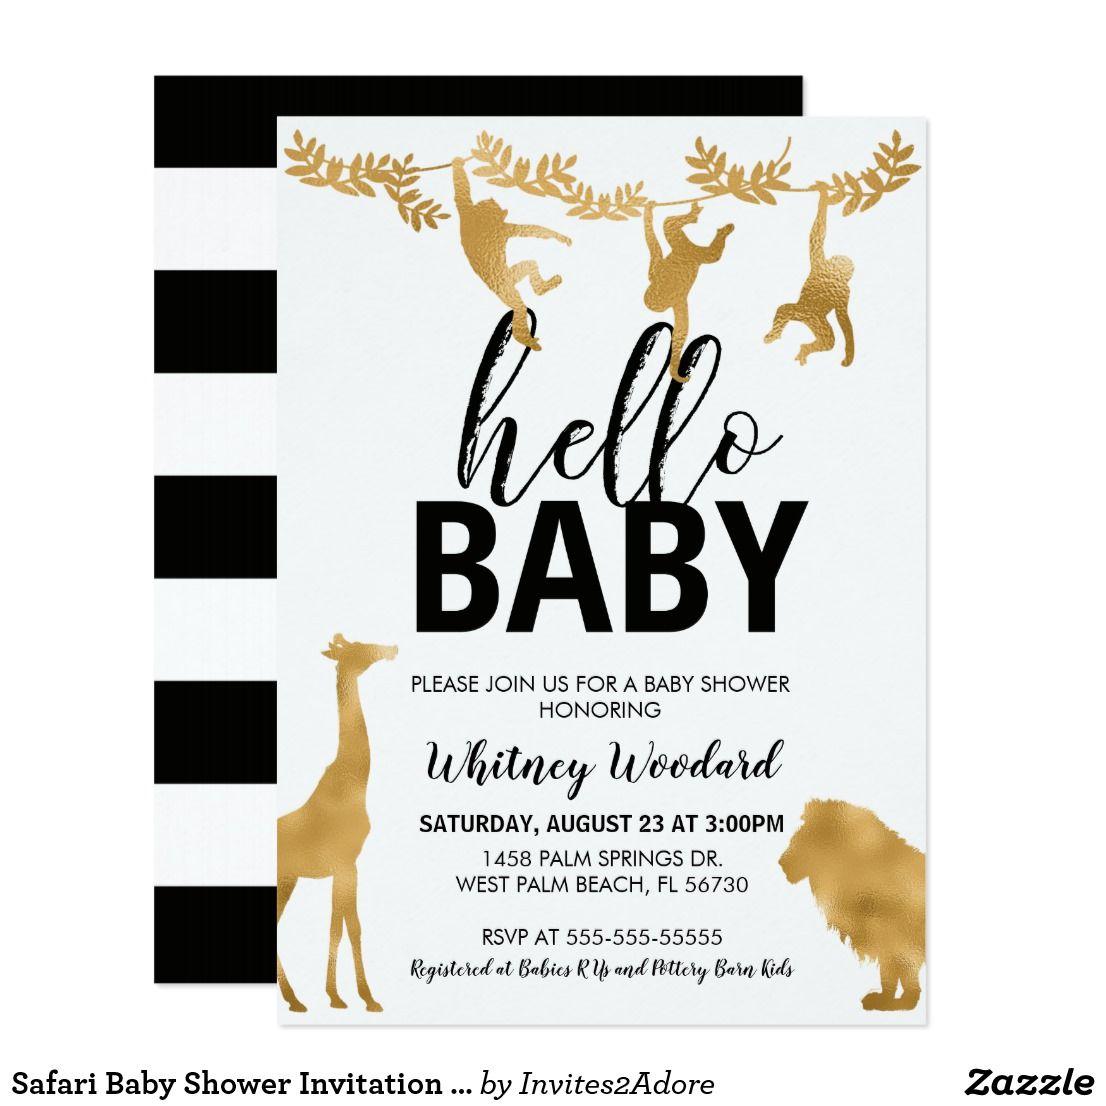 Safari Baby Shower Invitation | Black & Gold | Shower invitations ...